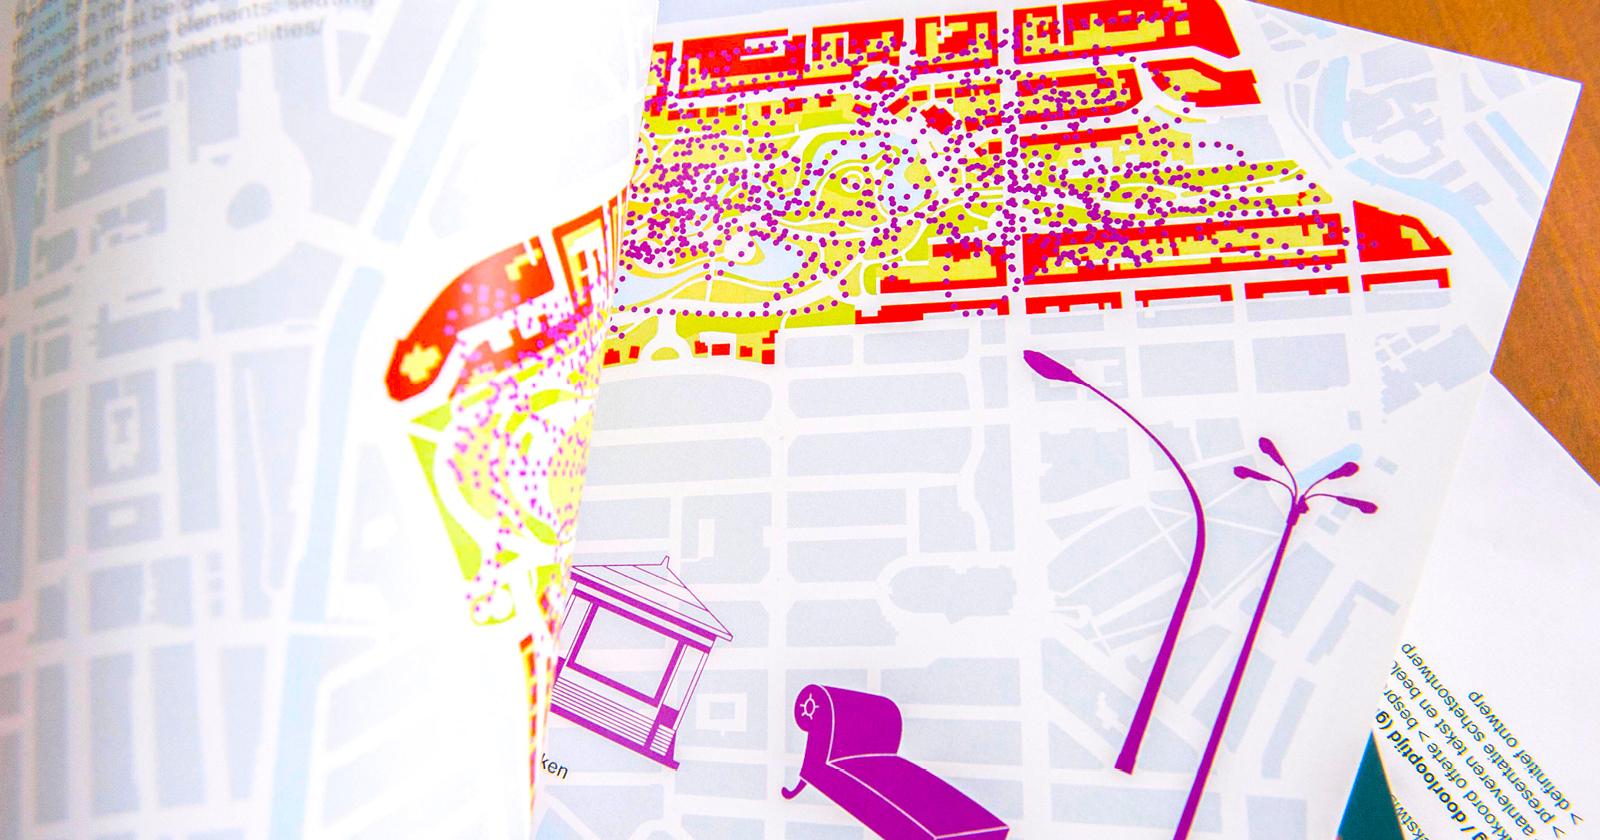 info-cartografics15-PubliekGeheim